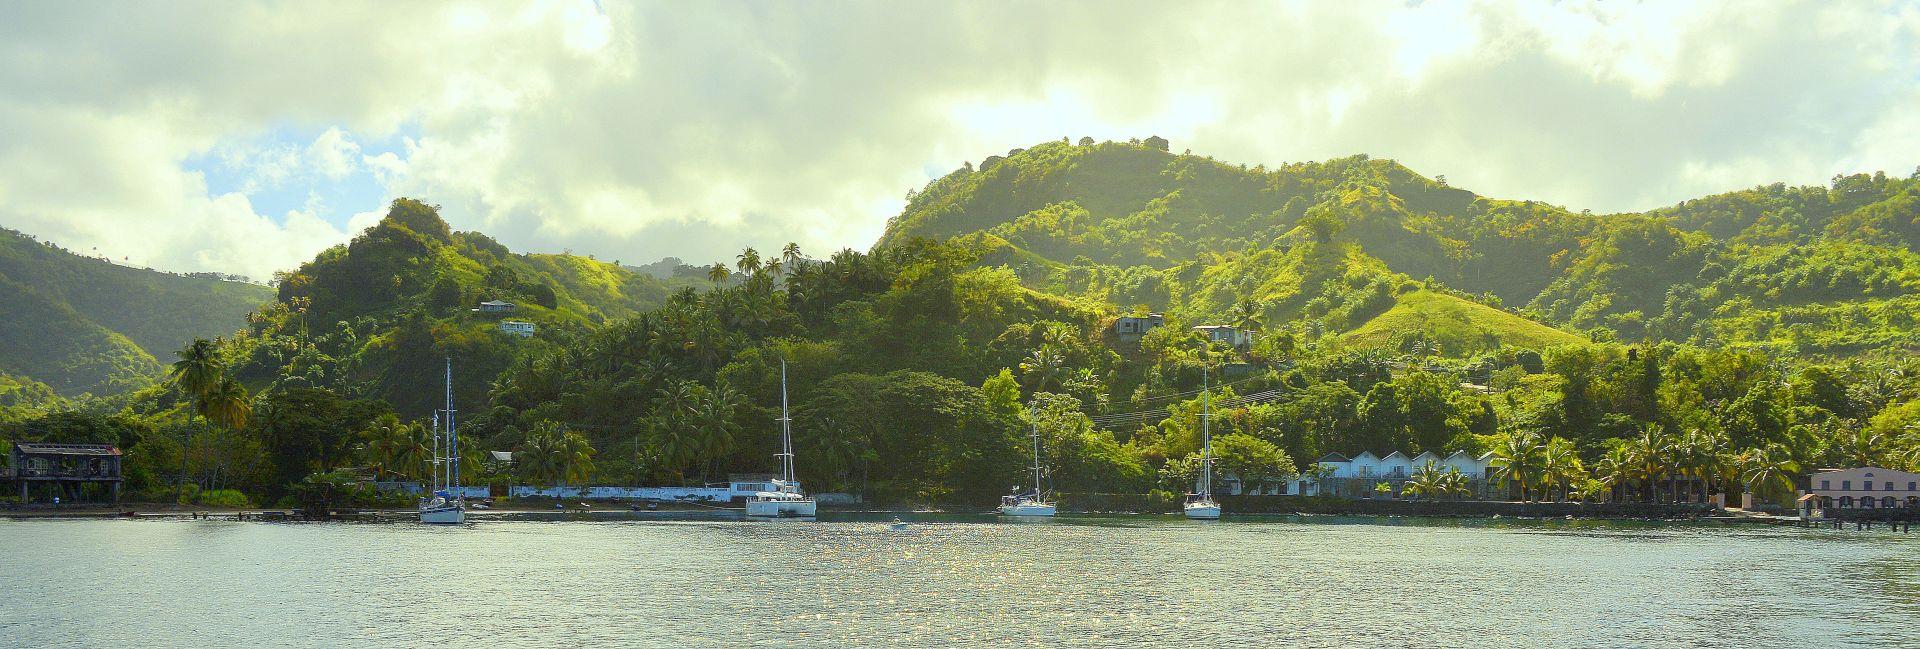 Louer un catamaran dans les Grenadines